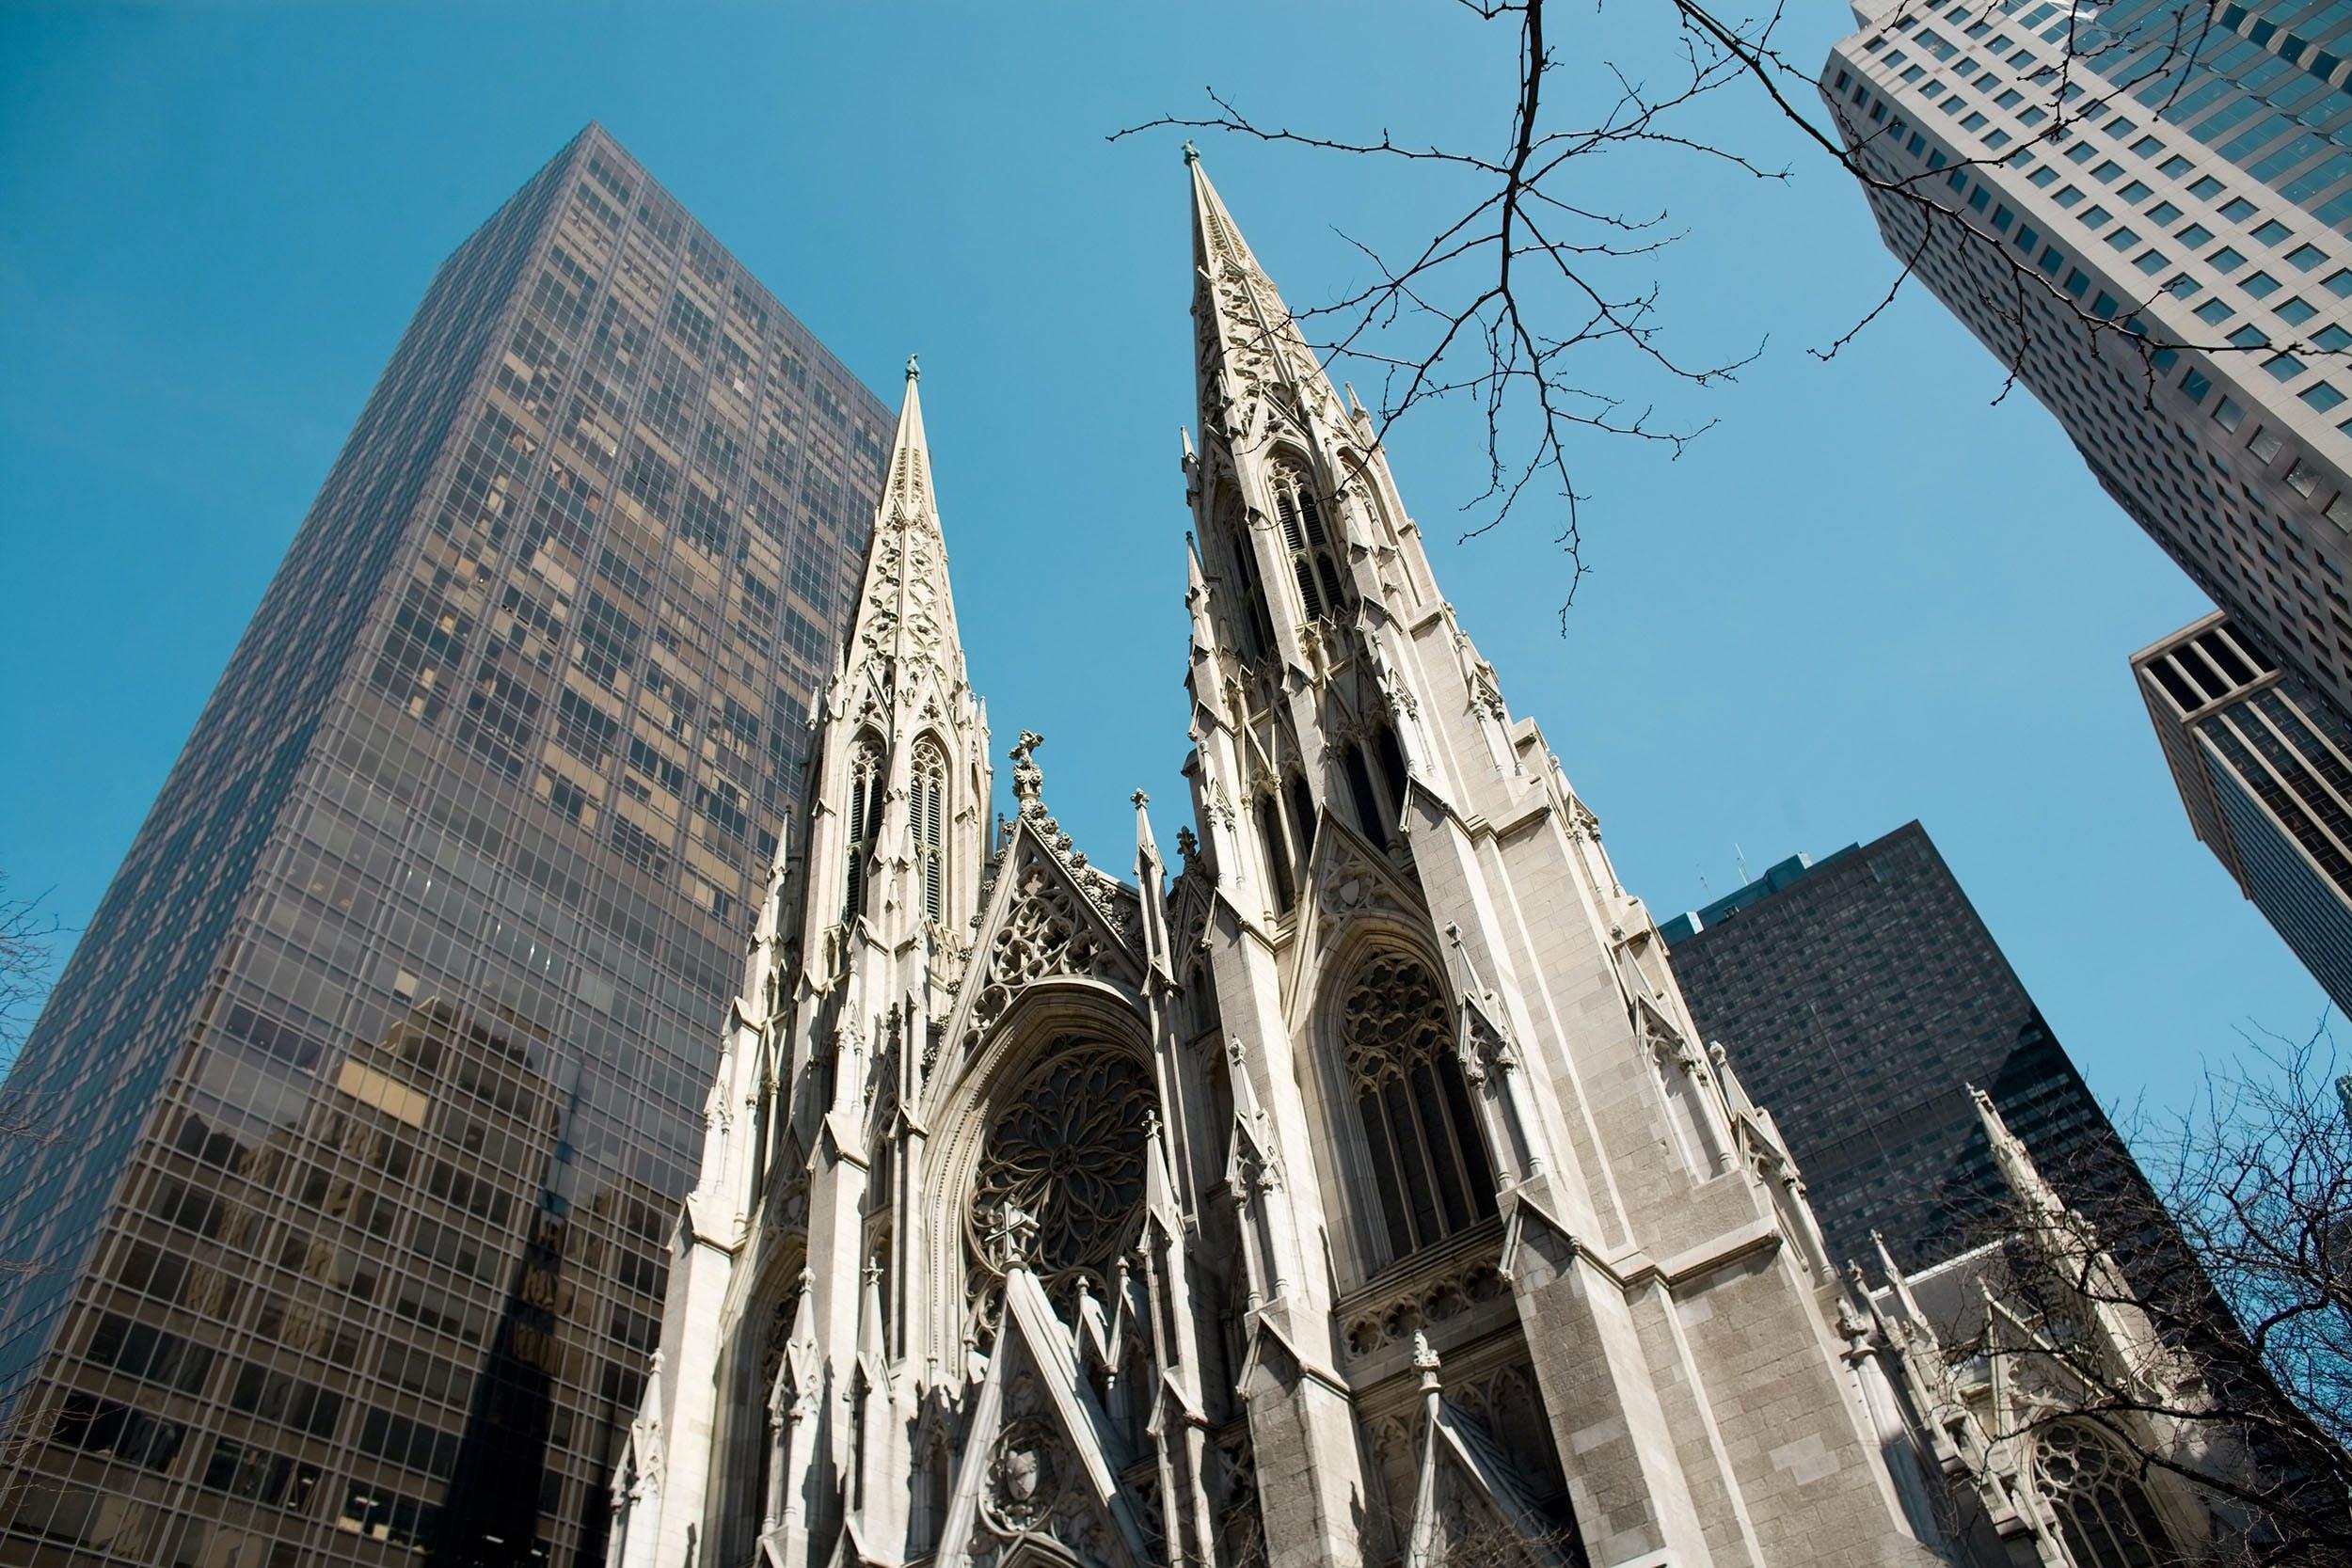 St. Patrick's Cathedral, Midtown Manhattan, New York City